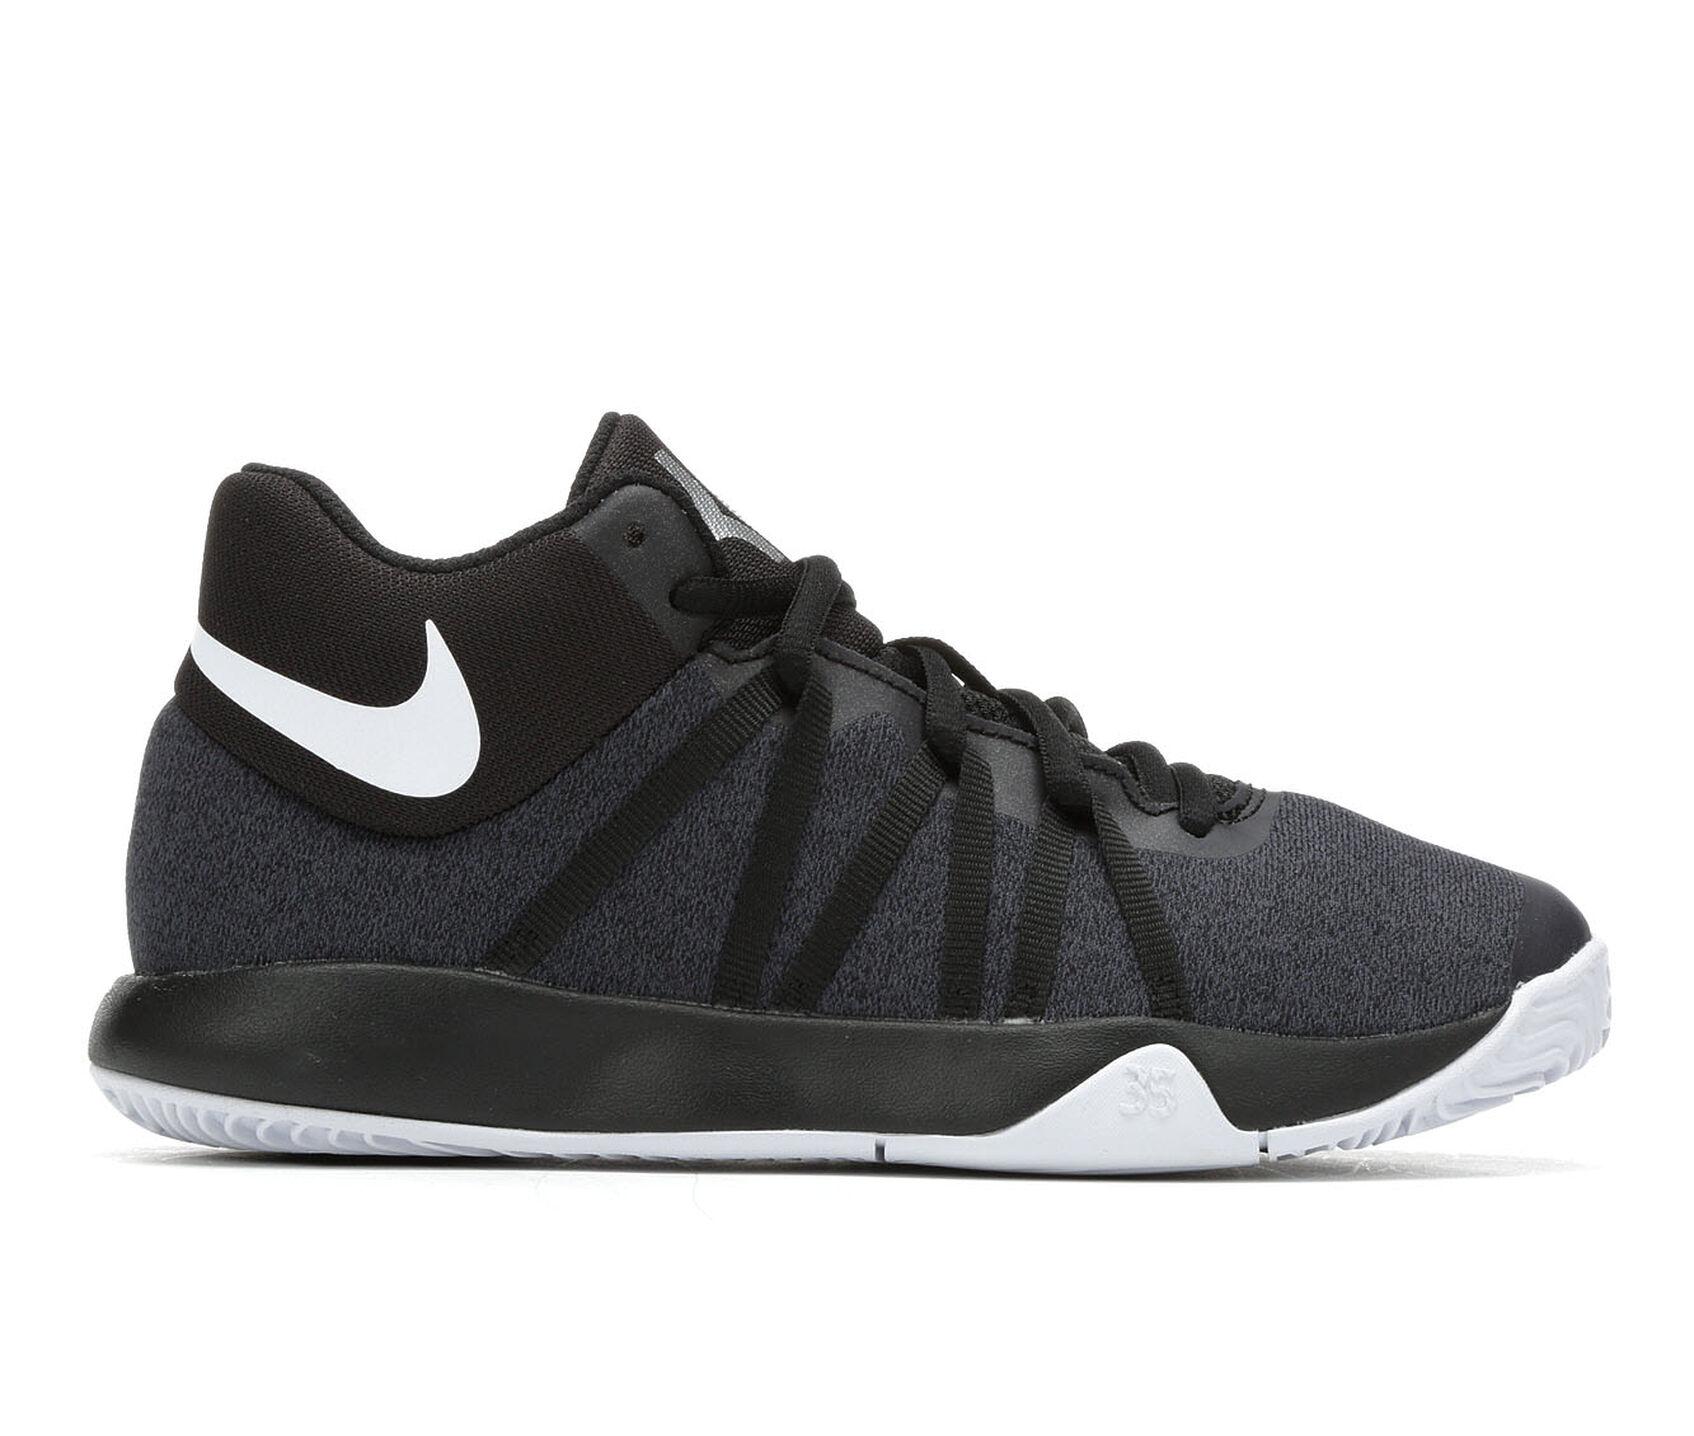 quality design 5e751 30008 ... Boys Nike Little Kid KD Trey 5 V High Top Basketball Shoes Shoe .